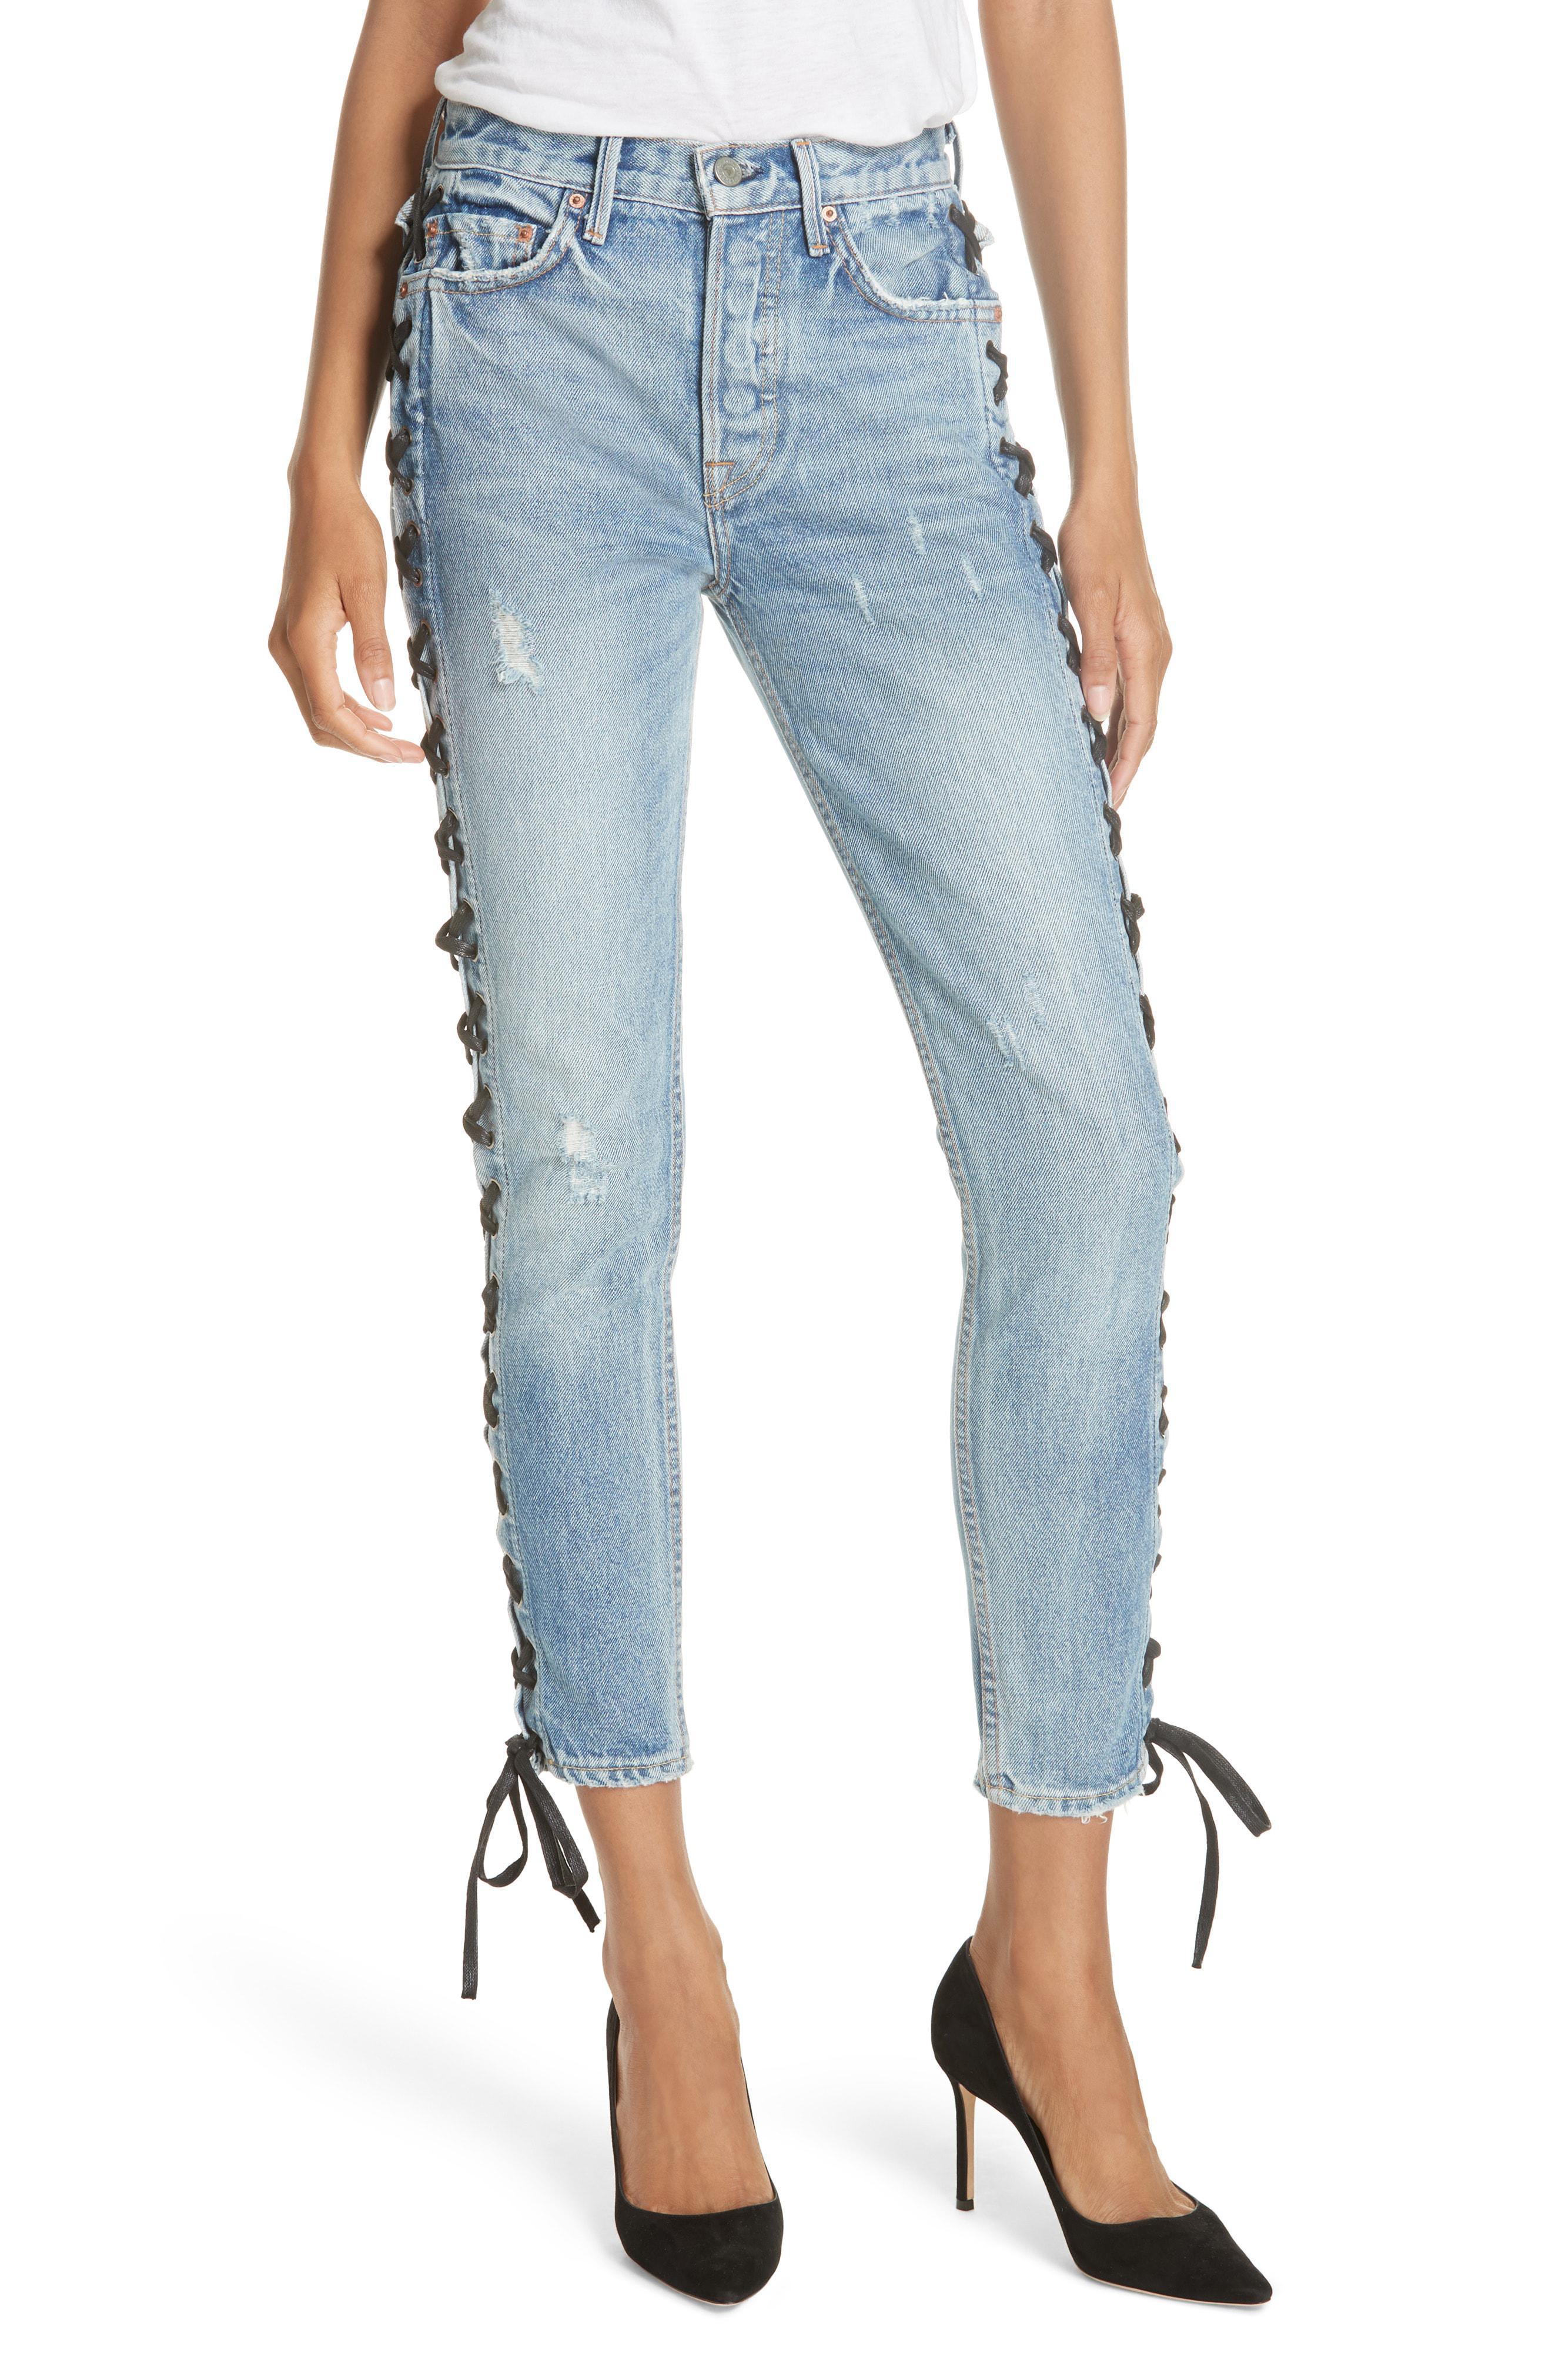 a53520c03c9 Lyst - GRLFRND Karolina High Waist Lace-up Crop Skinny Jeans in Blue